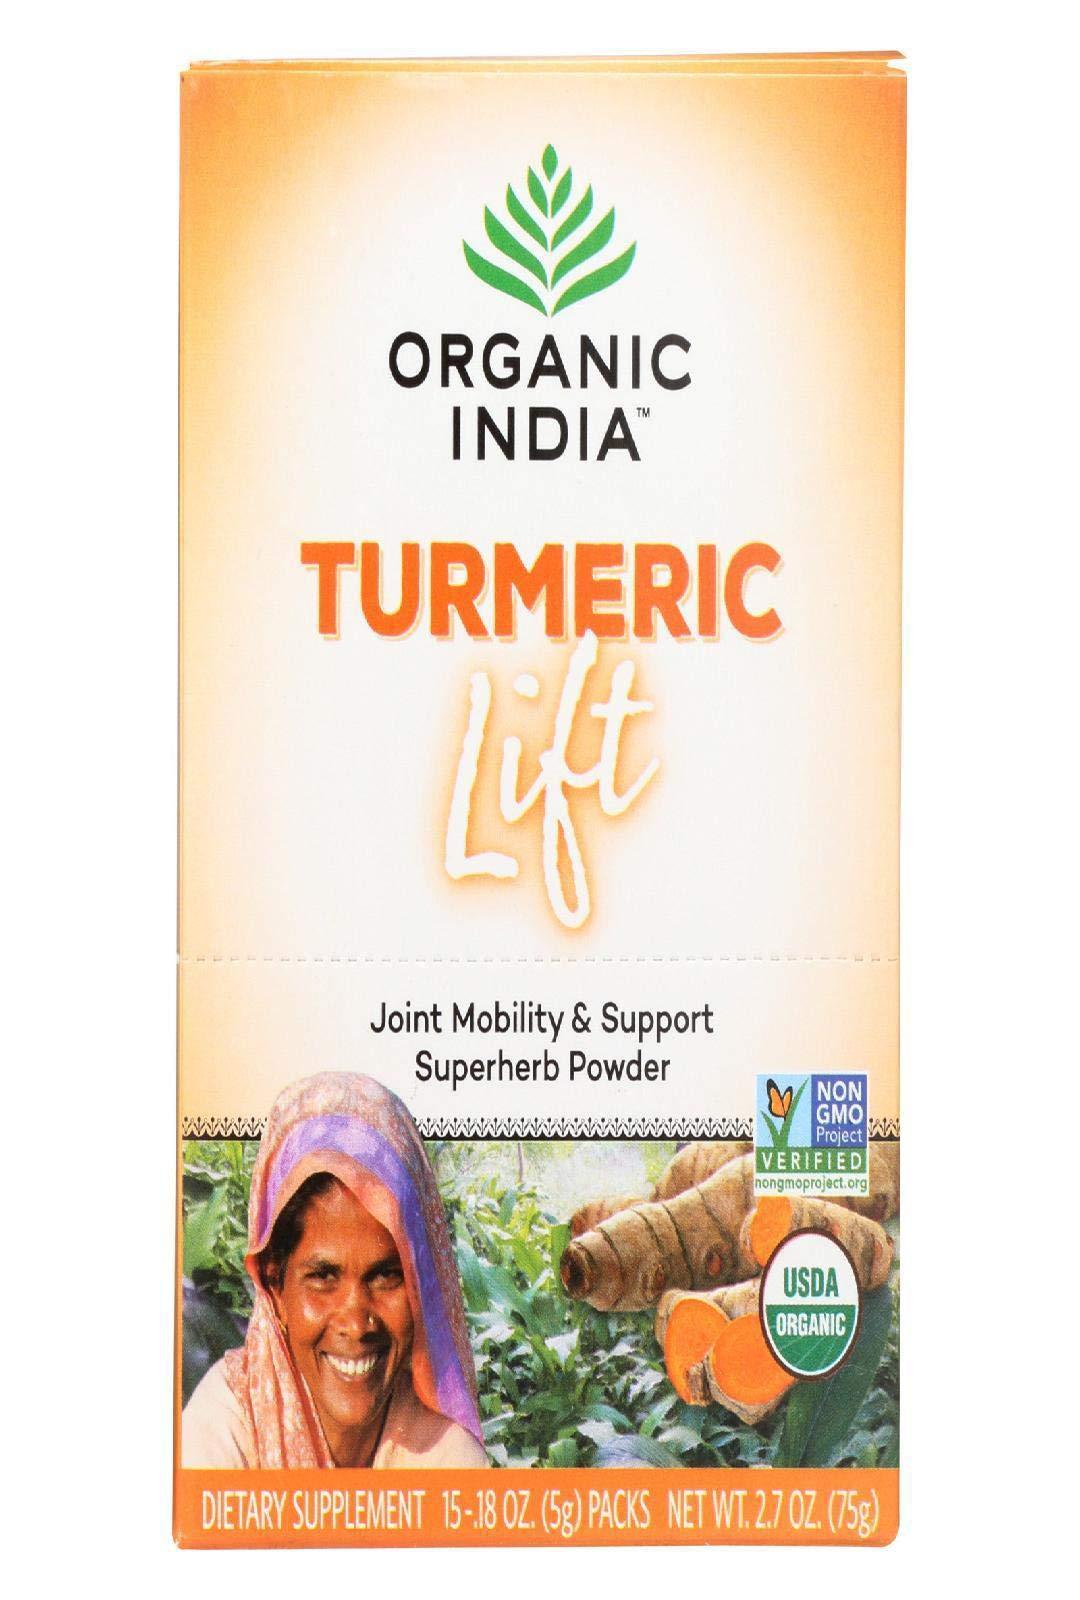 Organic India Turmeric Lift packets